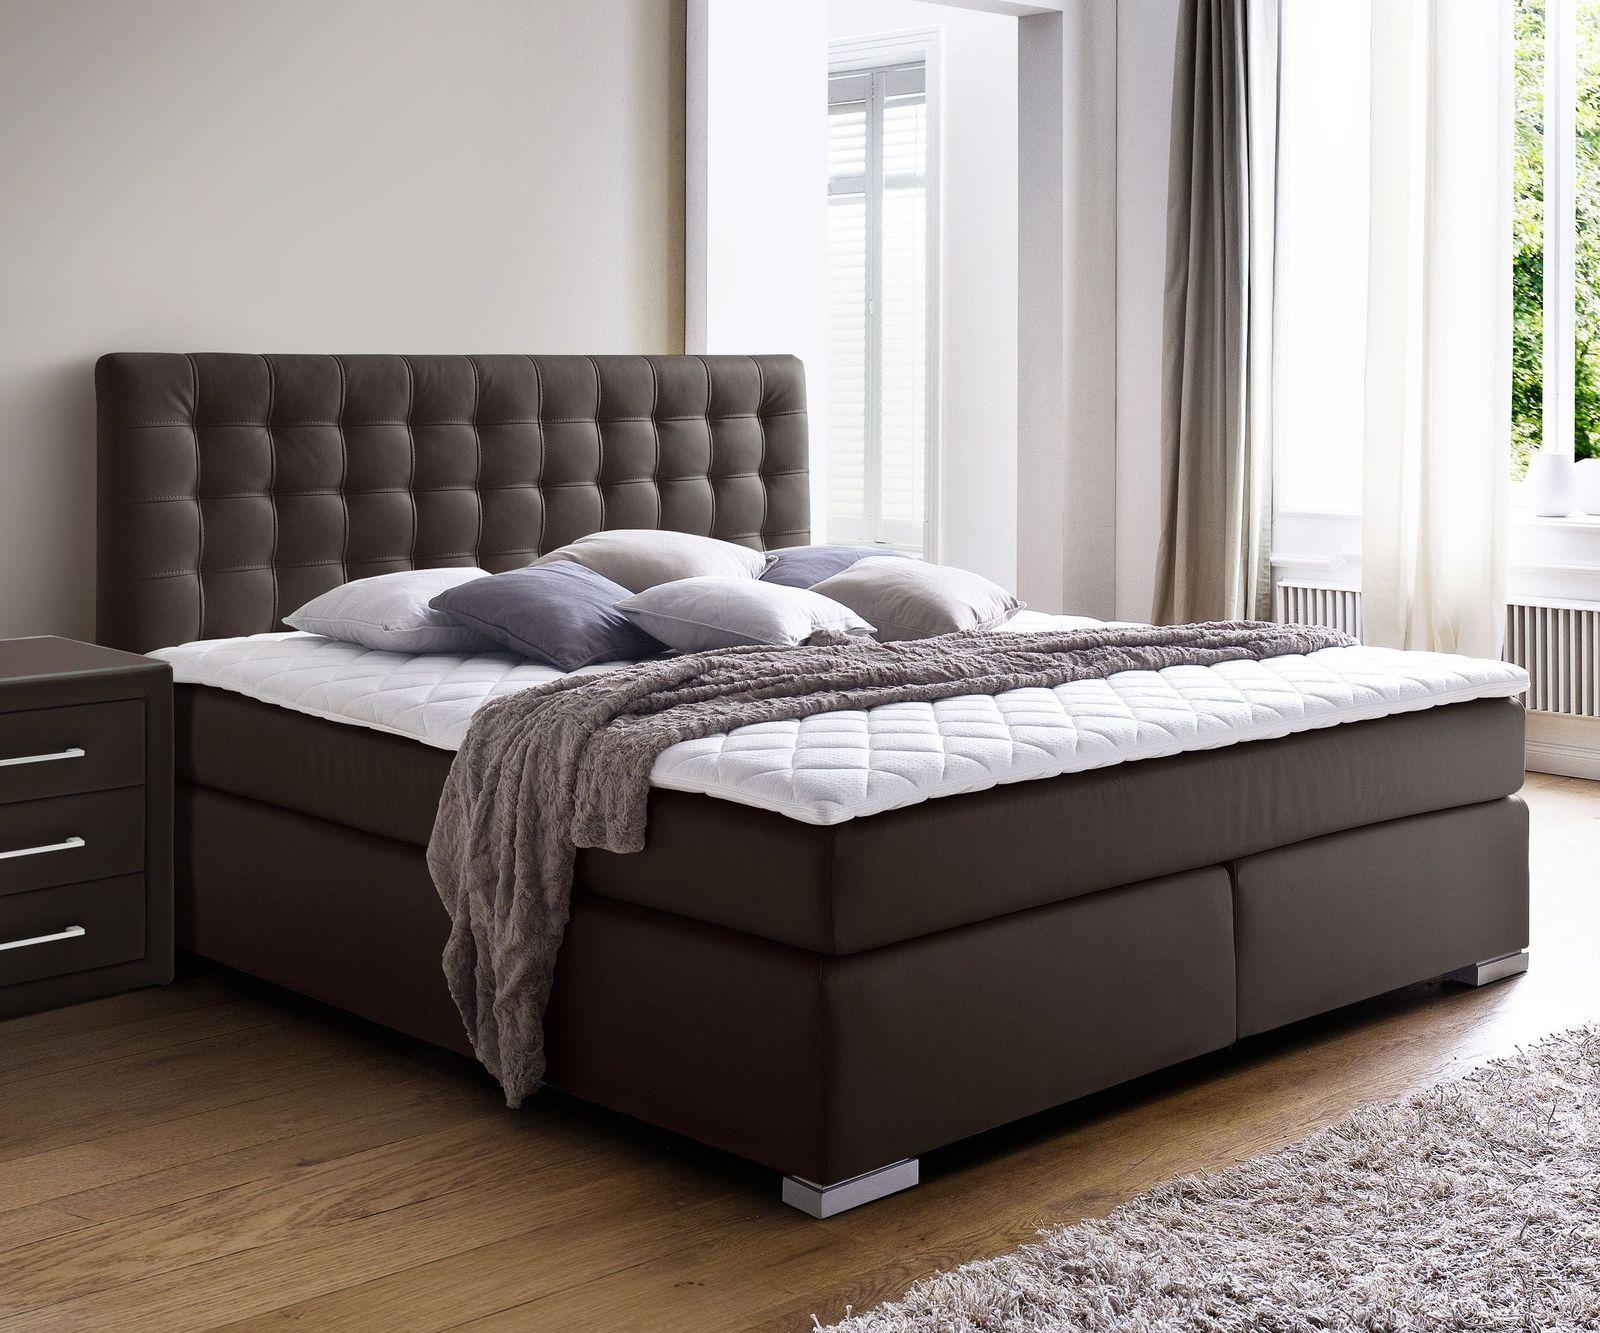 boxspringbett in z b 180x200 cm in h2 und h3 kaufen taimea. Black Bedroom Furniture Sets. Home Design Ideas